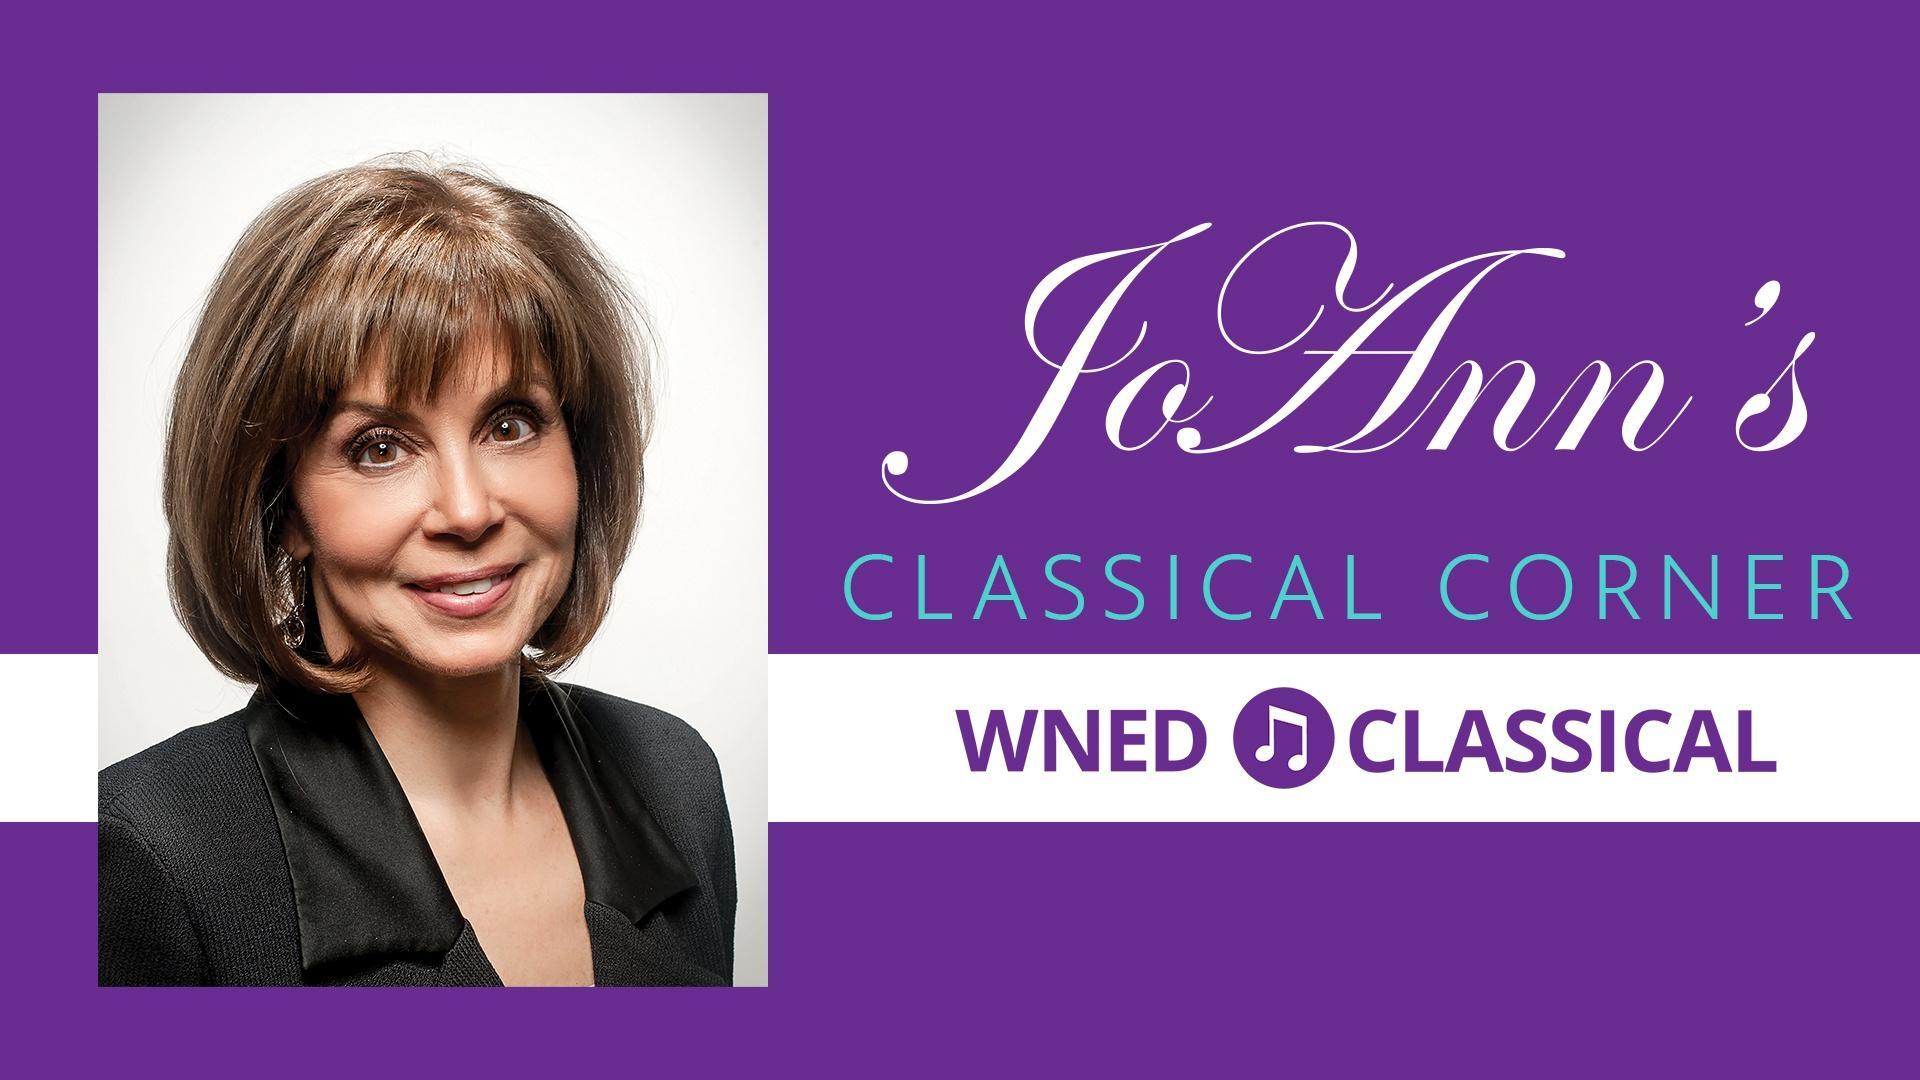 JoAnn's Classical Corner